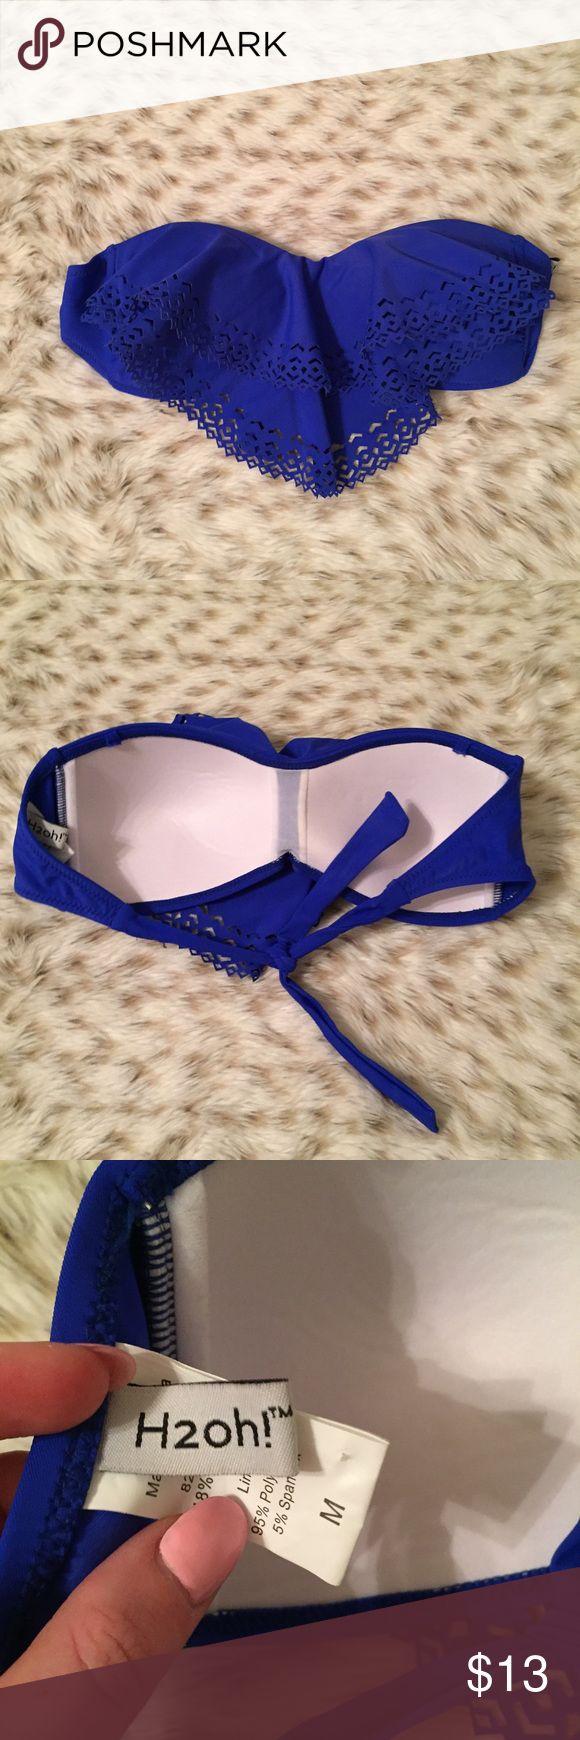 H2oh Royal Blue Laser Cut Out Flowy Bikini Top H2Oh Laser Cut Out royal blue Strapless Flowy bikini top! Padded! Size medium! Like new condition! So cute! H2oh Swim Bikinis